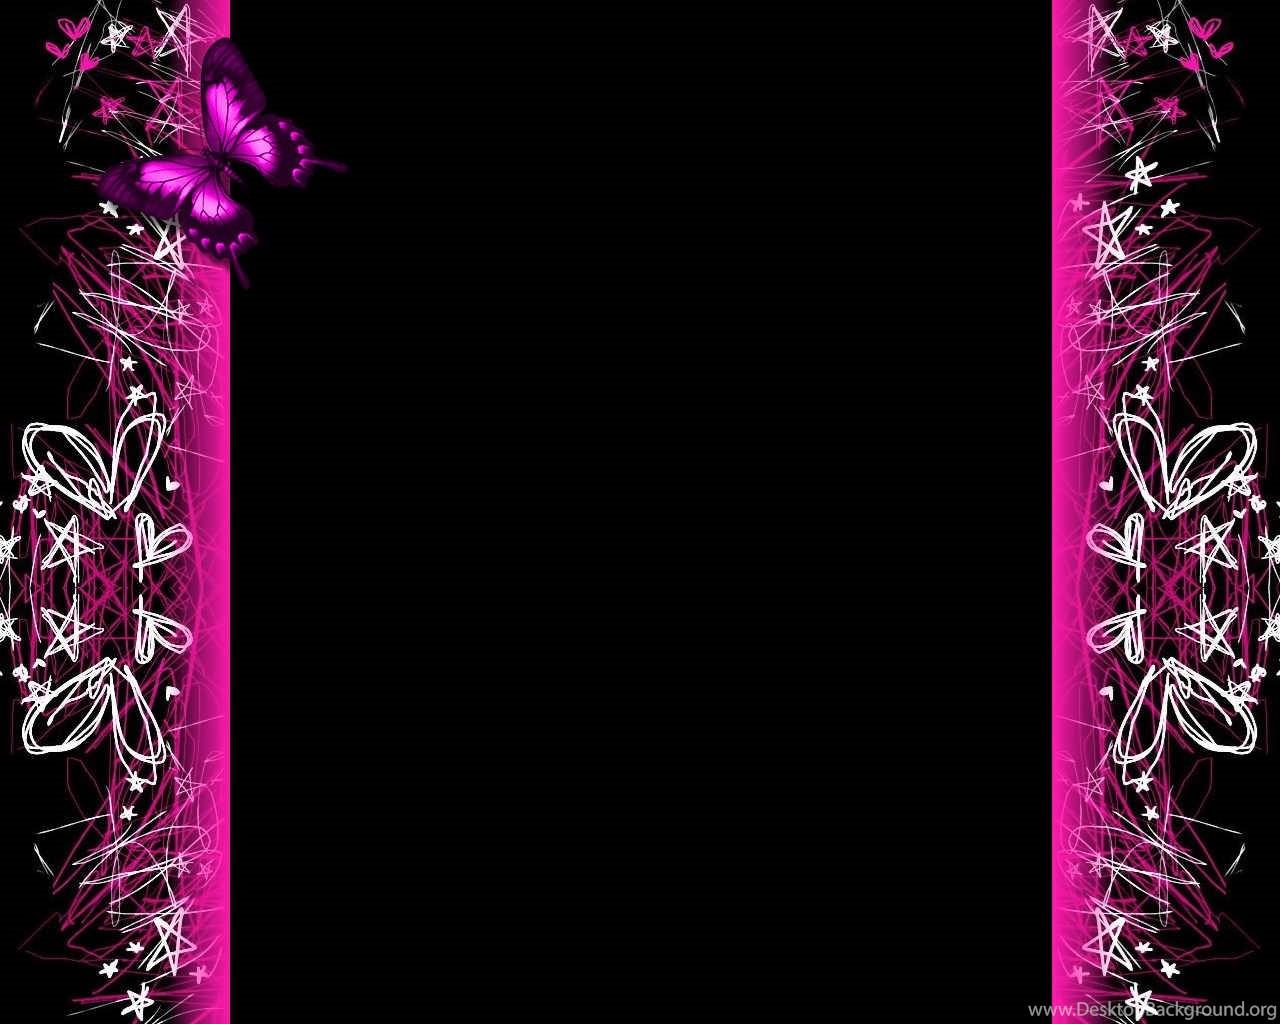 Hearts Myspace Backgrounds Desktop Background 1280x1024